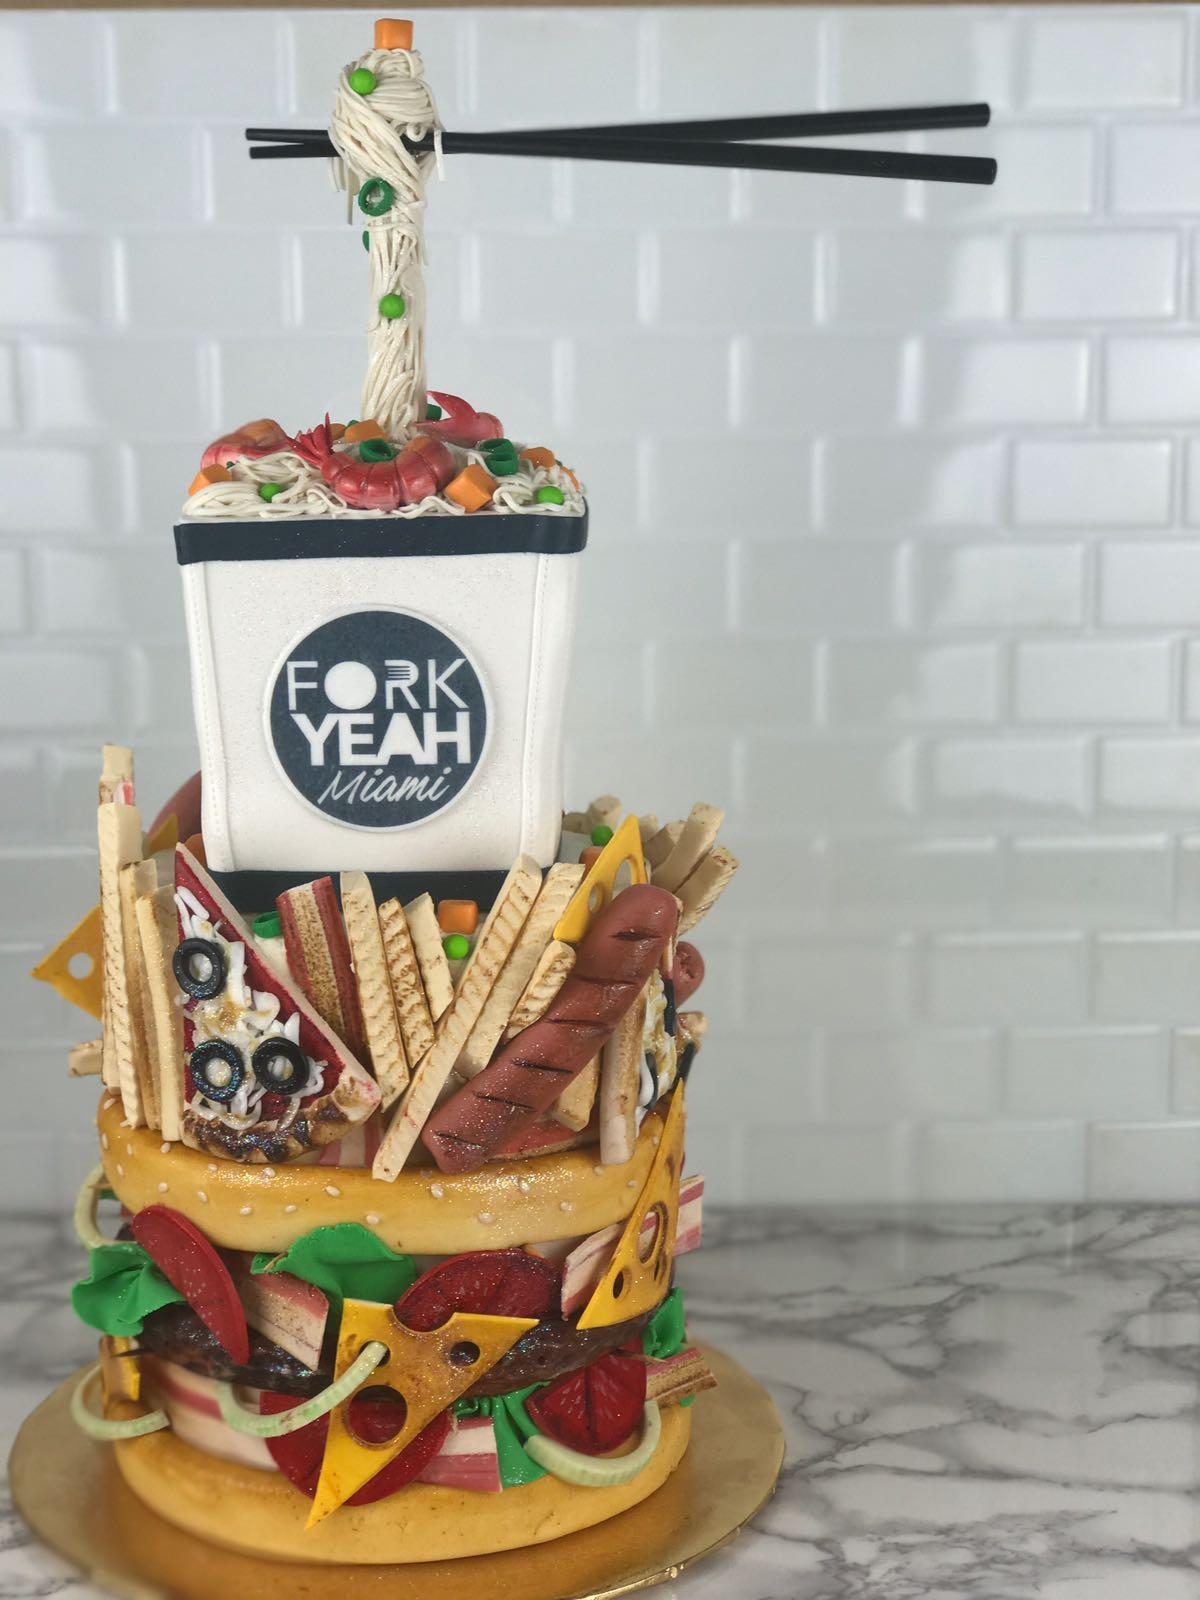 Junk food themed fondant birthday cake